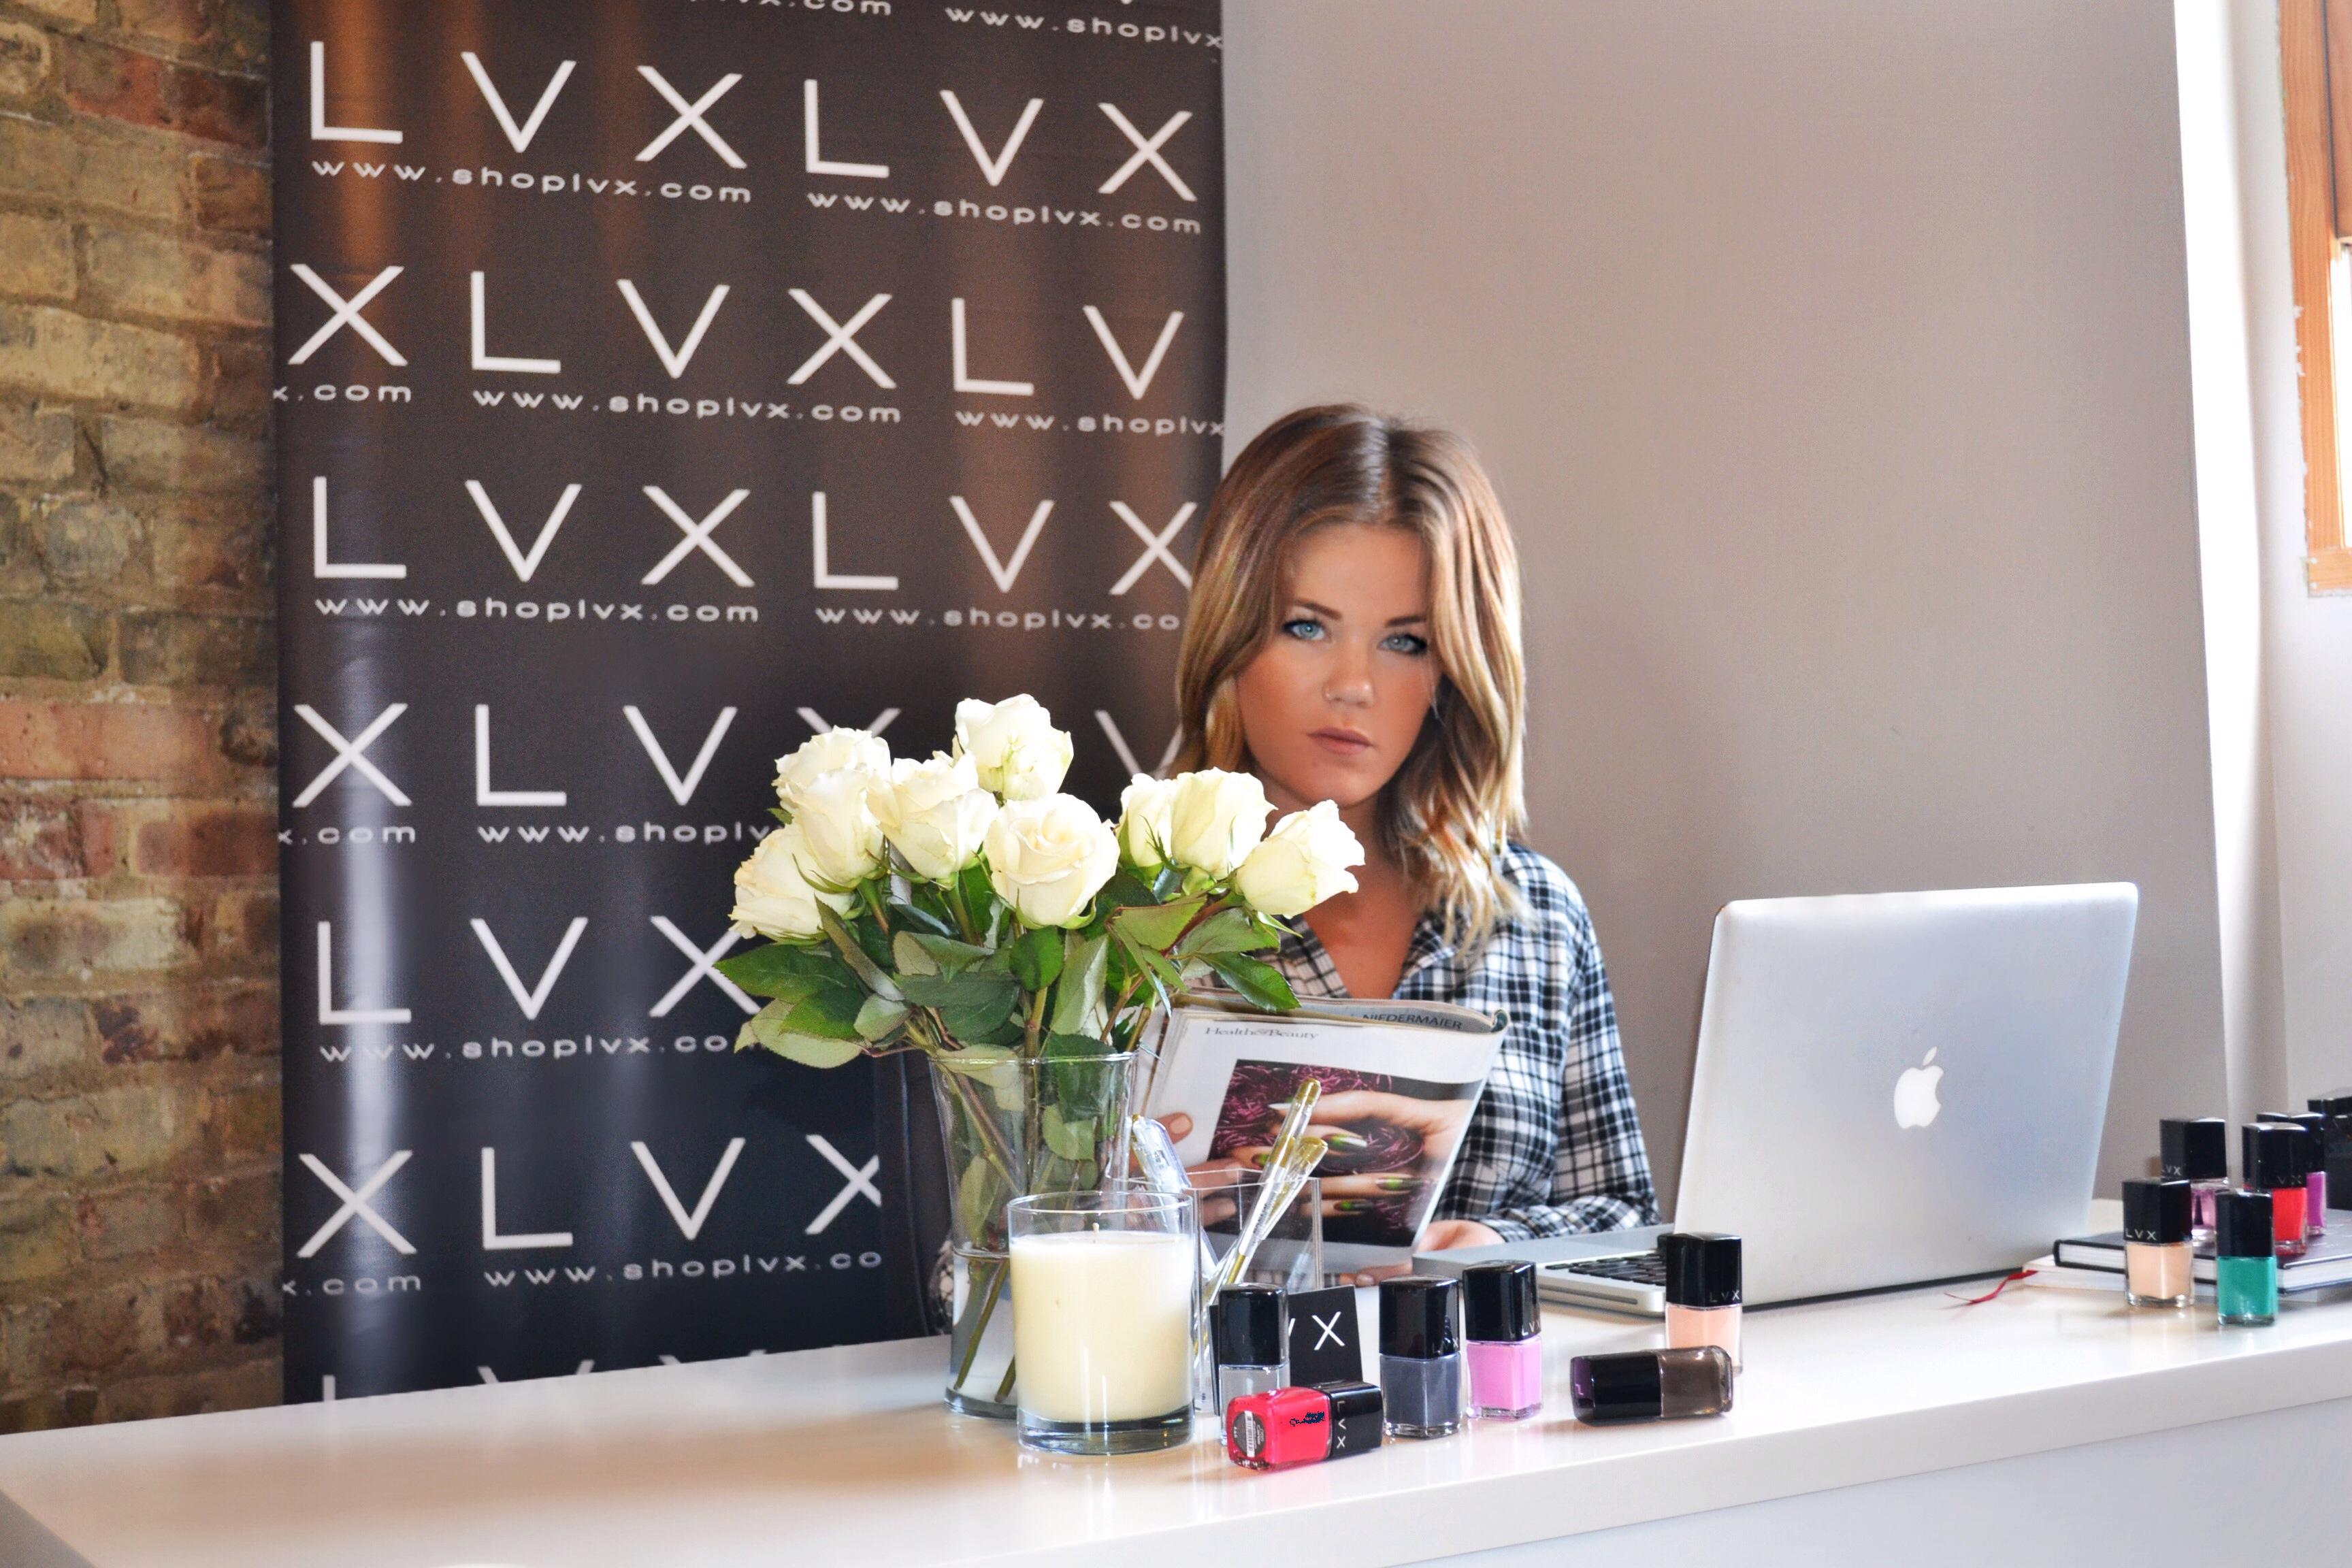 Photo: LVX Founder Branka Tomic